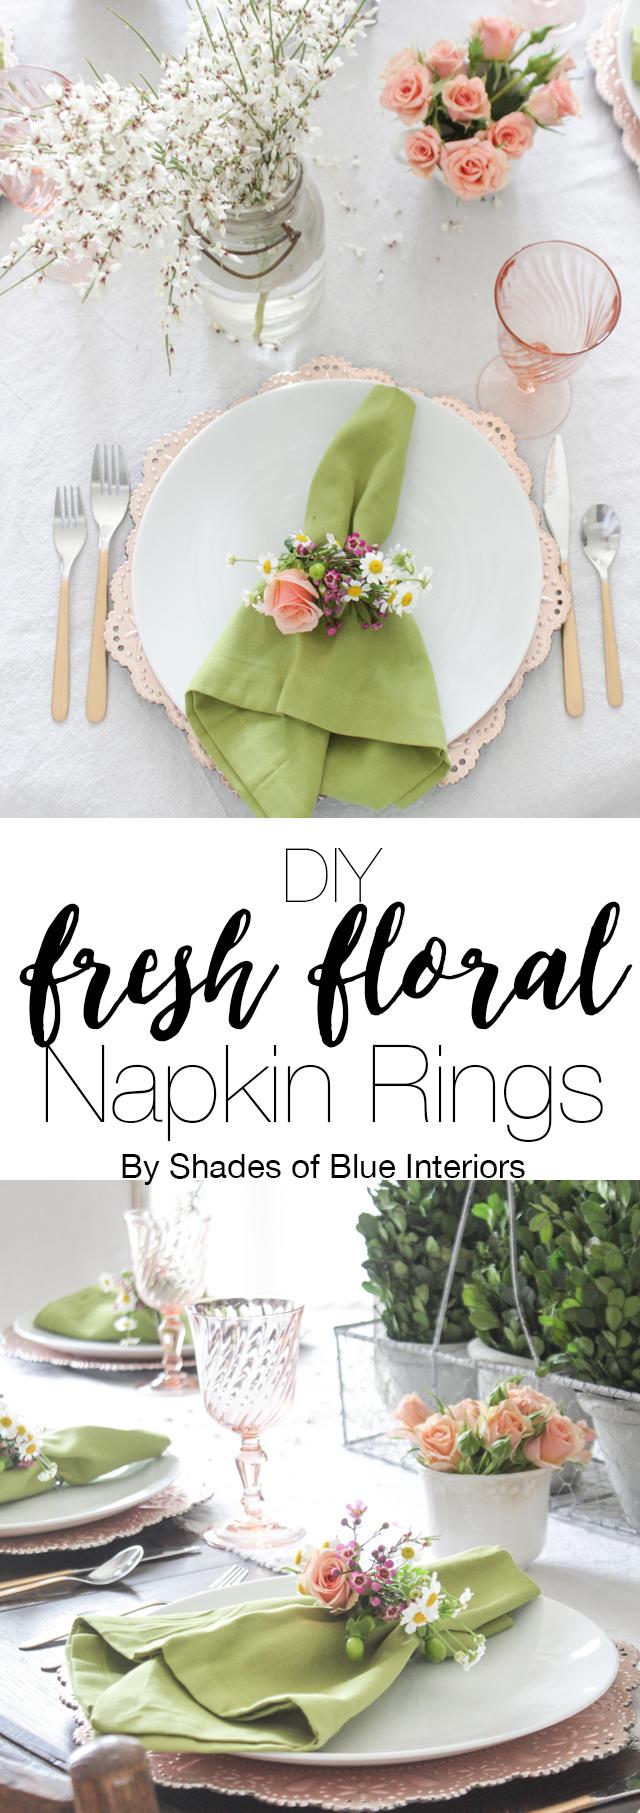 DIY-Fresh-Floral-Napkin-Rings